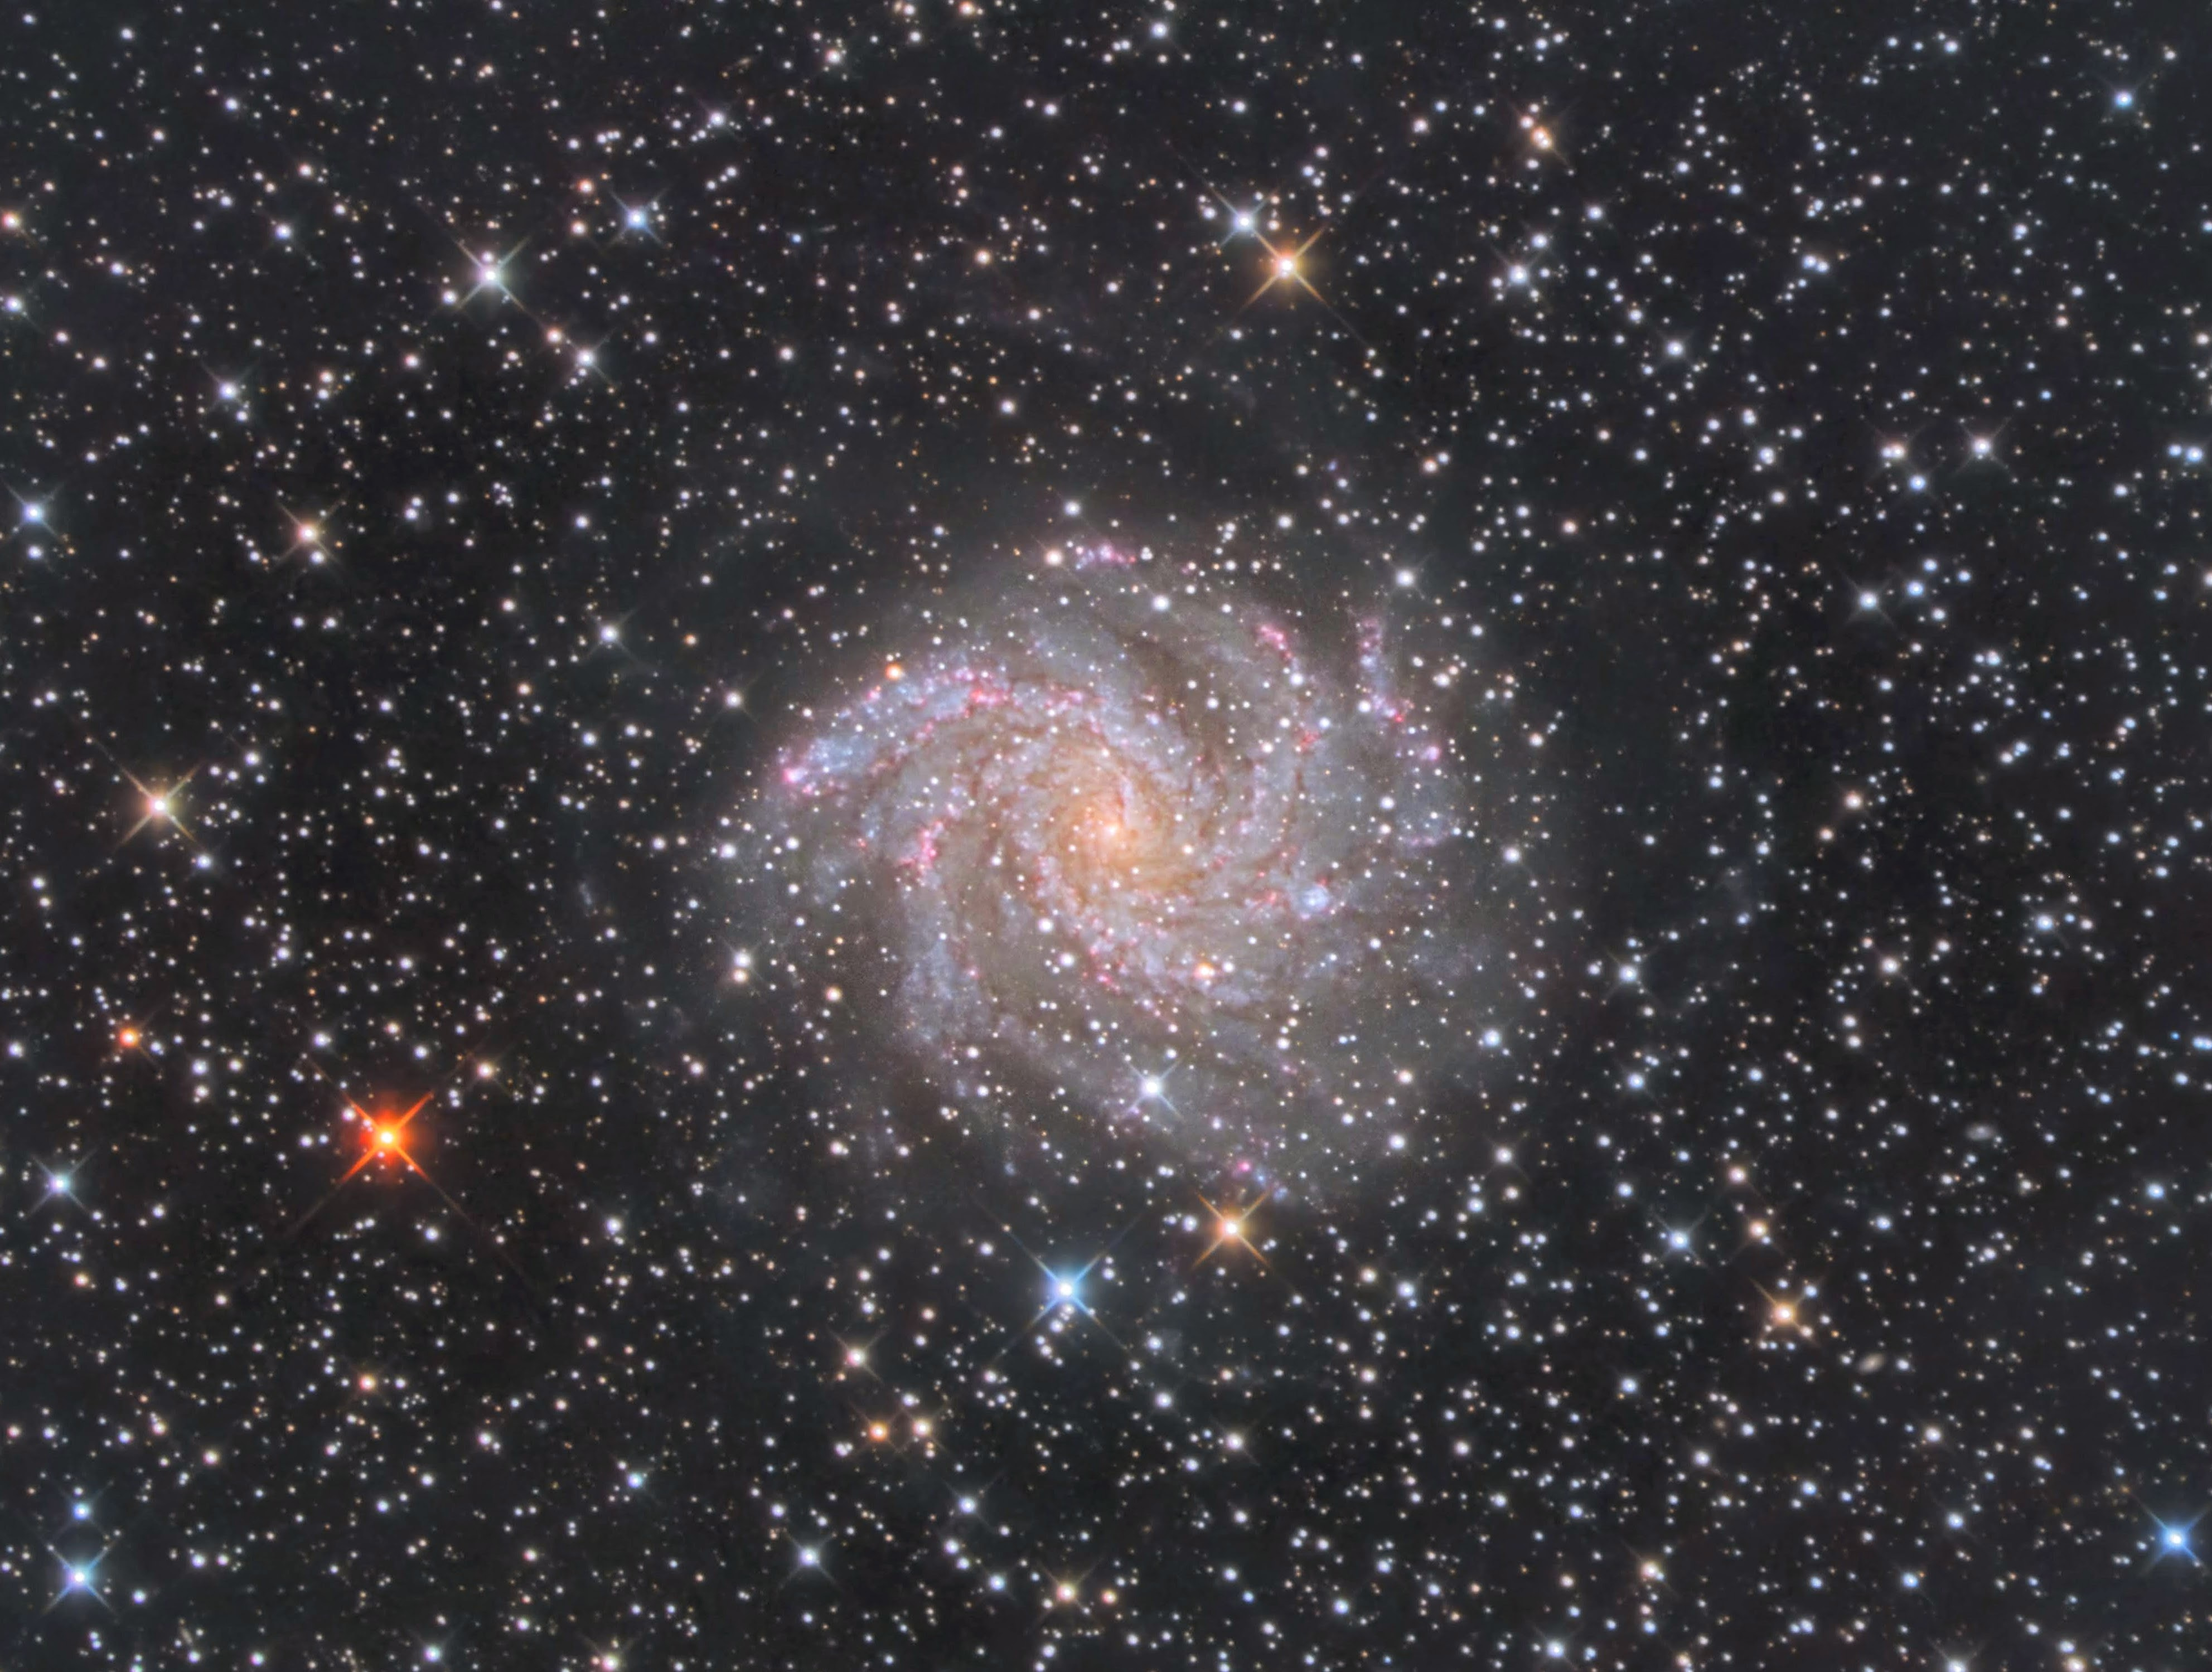 20200818 大芦高原_20200620 八塔寺 NGC6946 u-250crs 1600MM2 gain139 300s LRGB denoise2